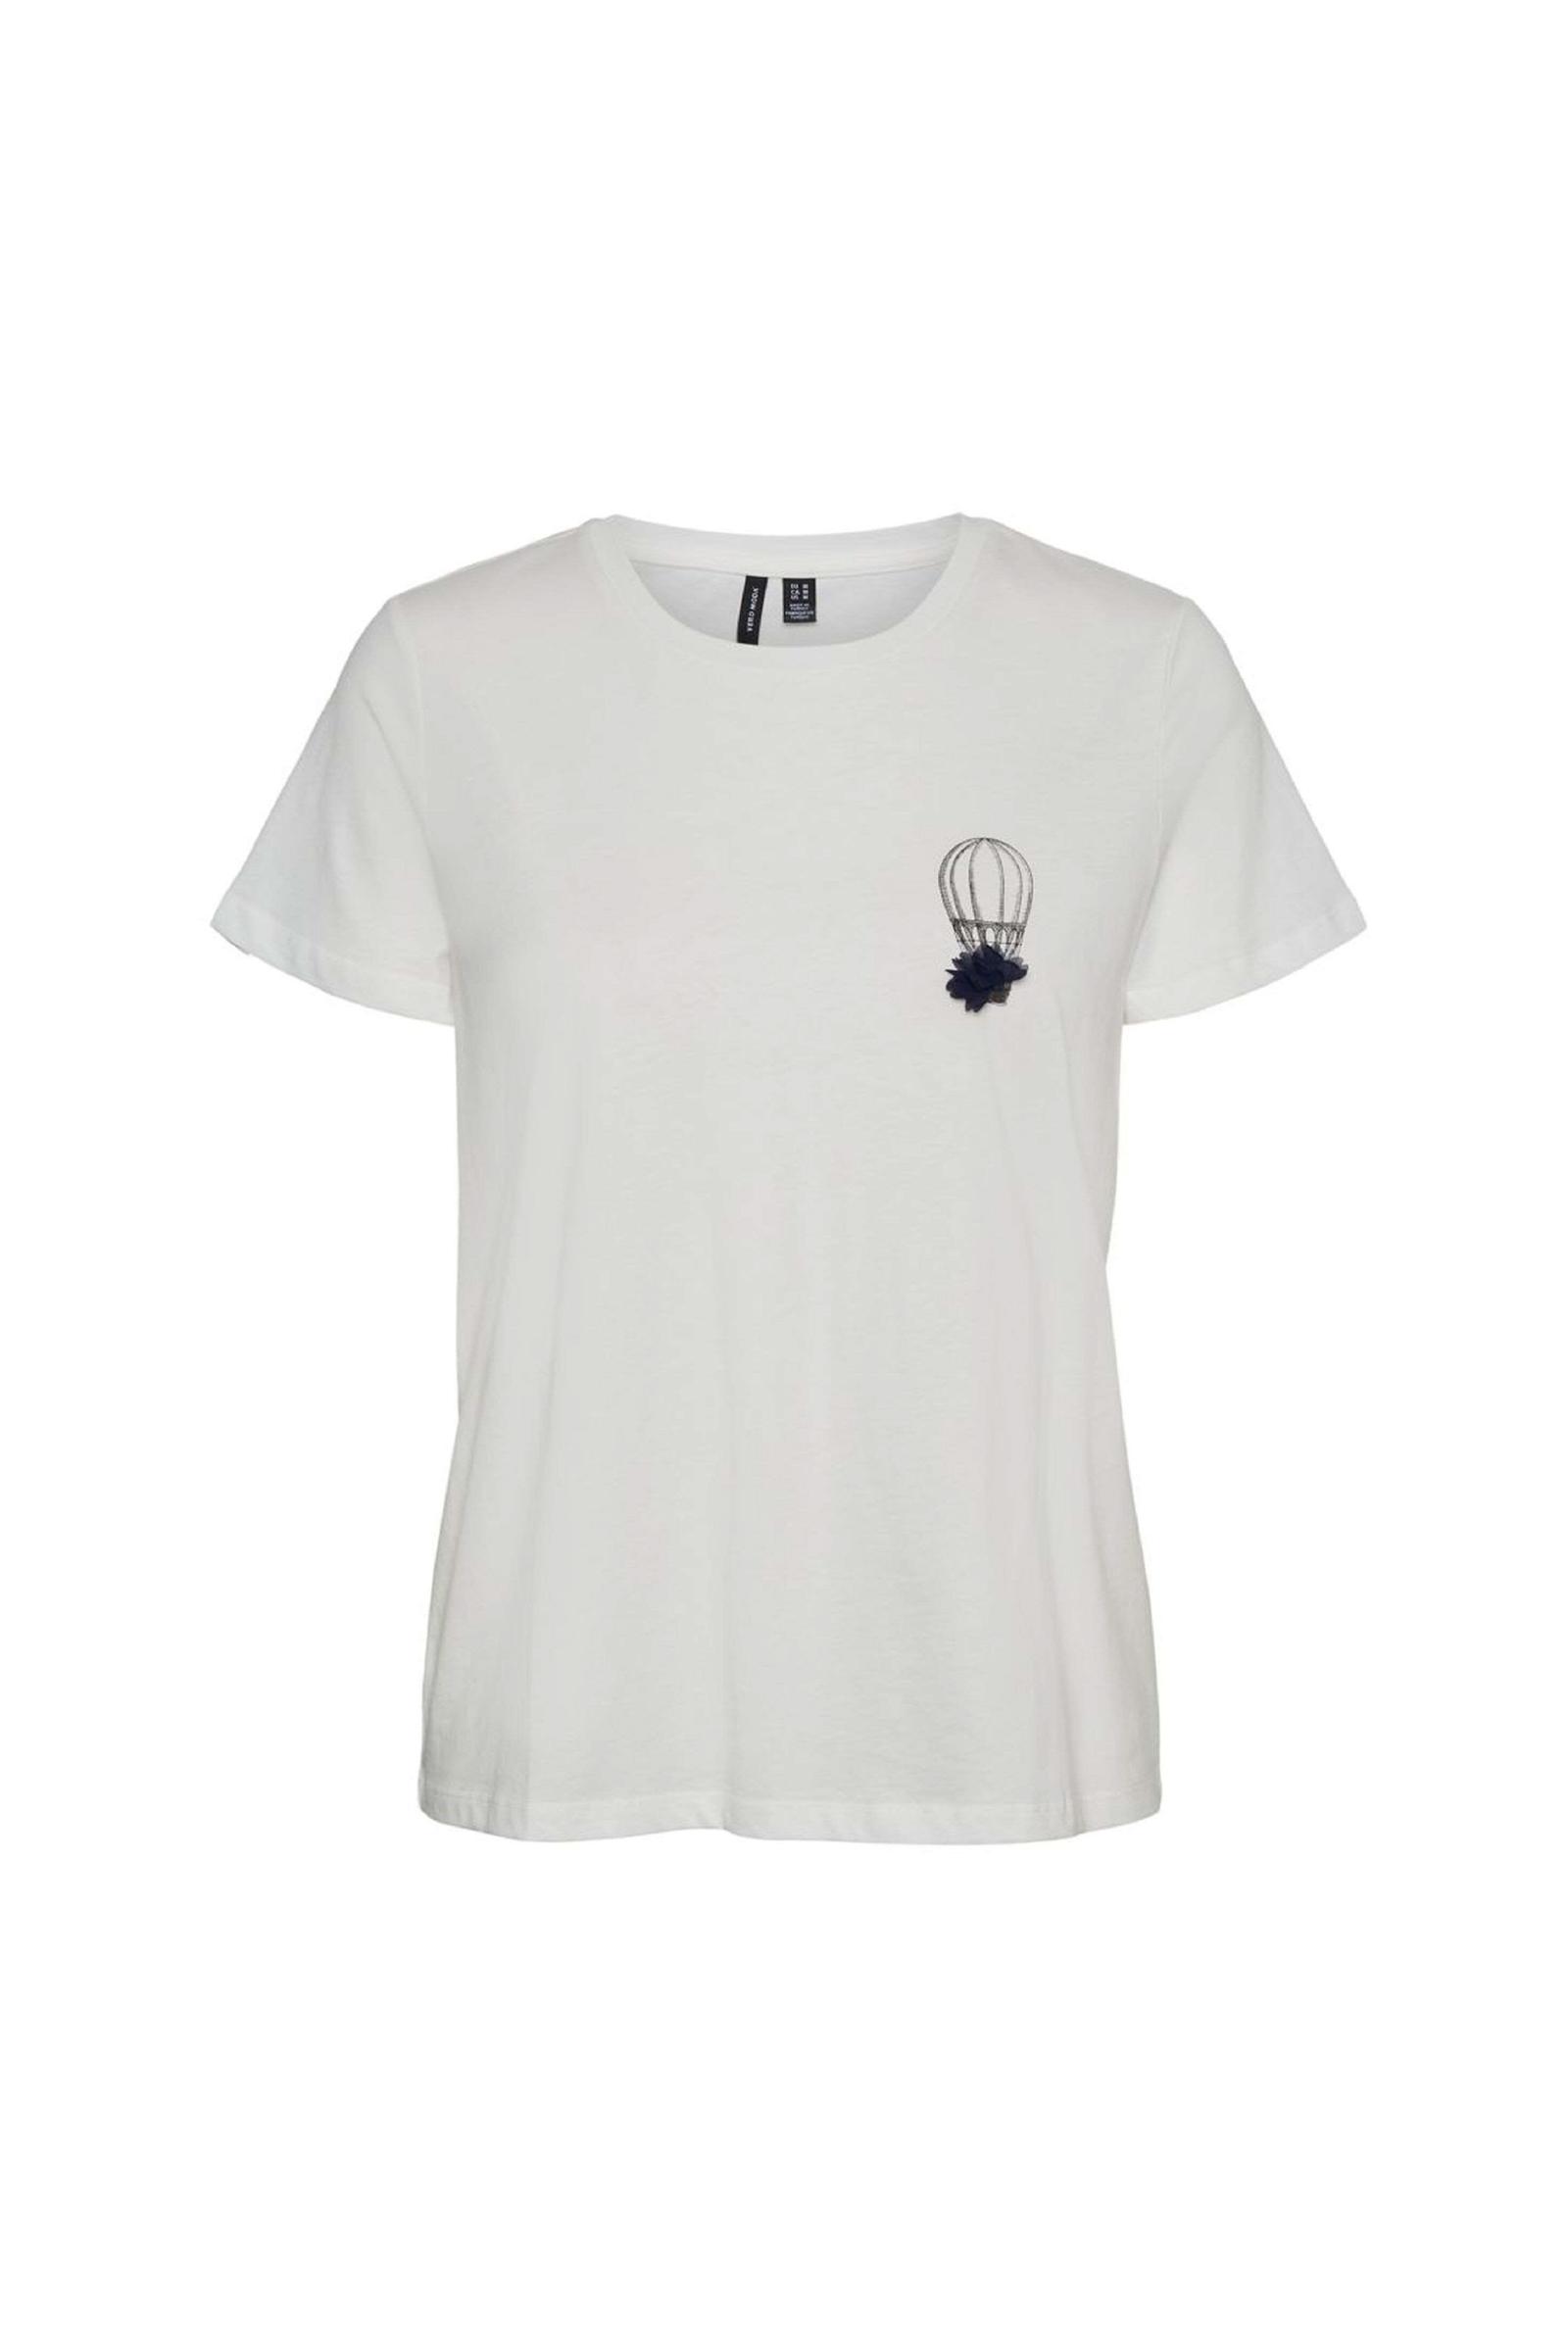 VERO MODA T-SHIRT Donna Modello DONNAFRANCIS VERO MODA   T-Shirt   10244391Print-AIRBALOON